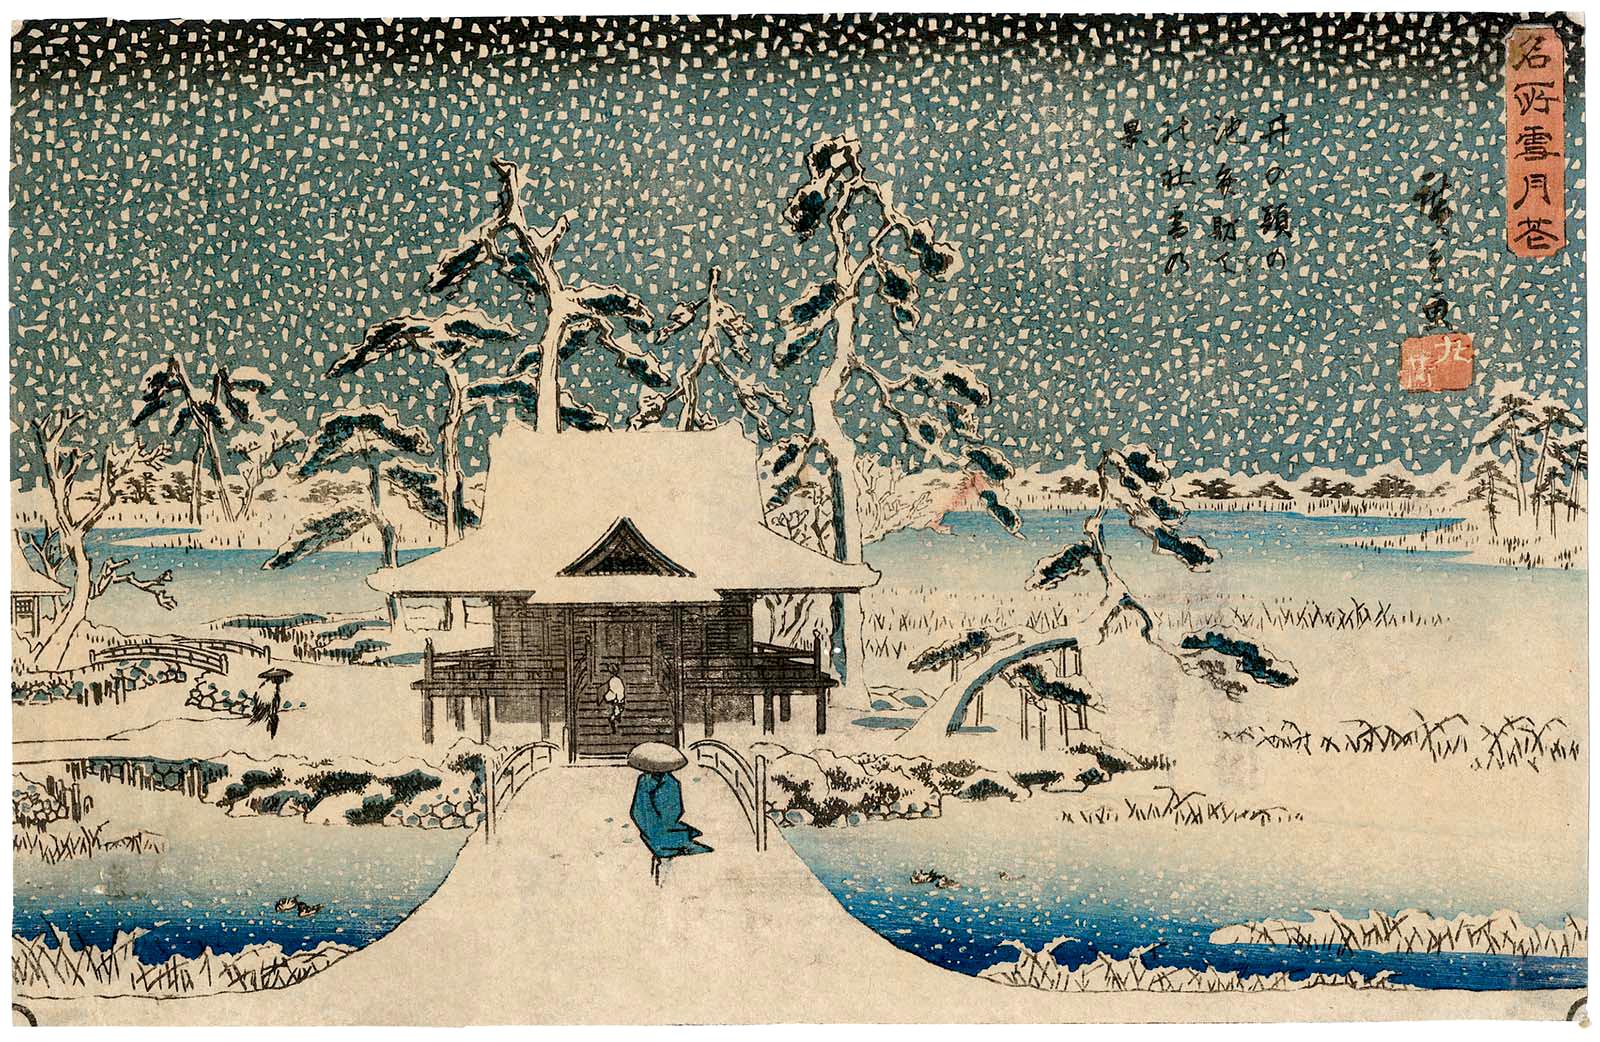 Utagawa Hiroshige, Snow Scene at the Shrine of Benzaiten, 1844 Woodblock Print, from the  Museum of Fine Arts, Boston .